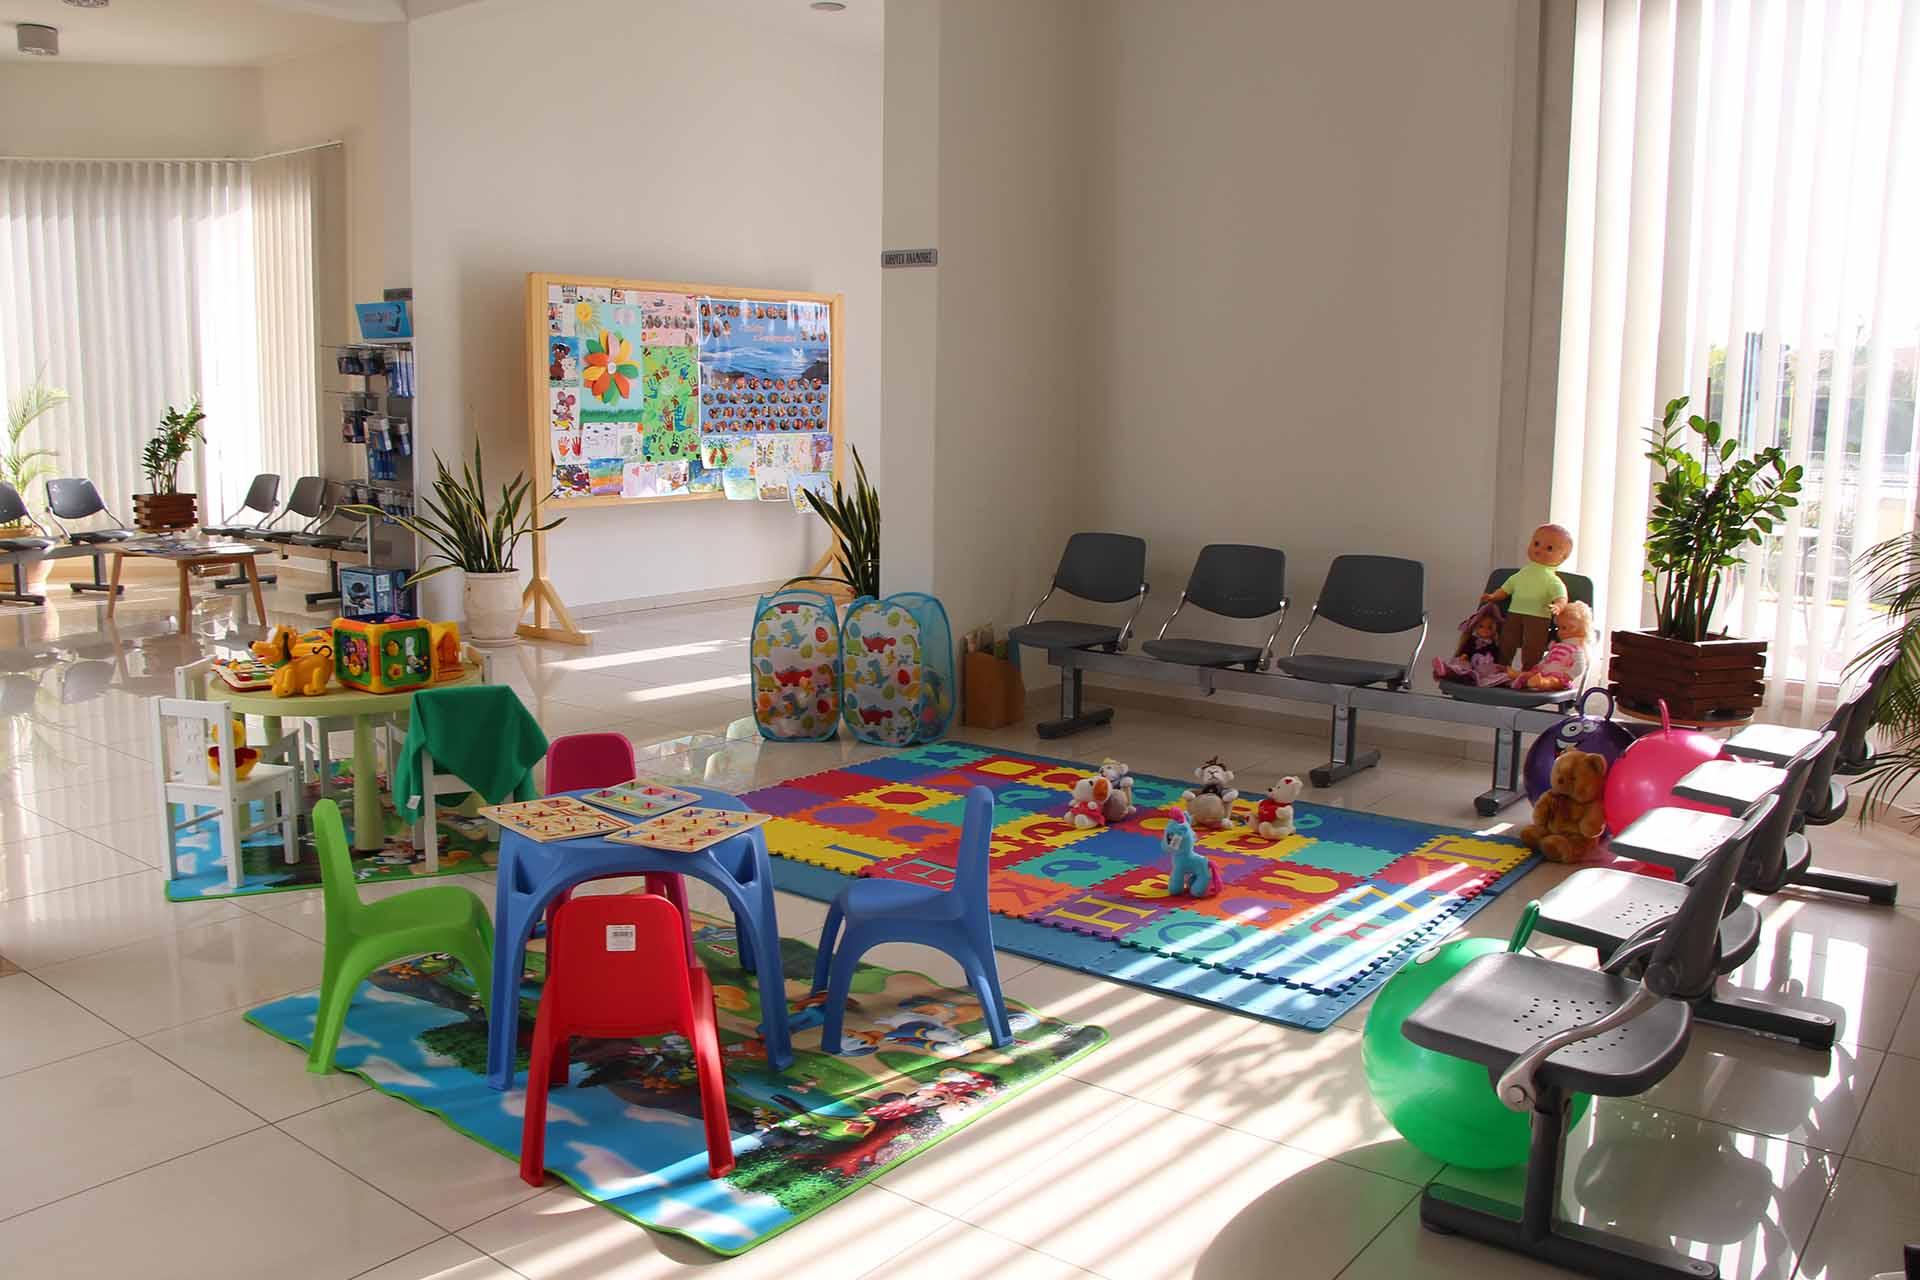 Toumazi Physio Gallery - Kids therapy